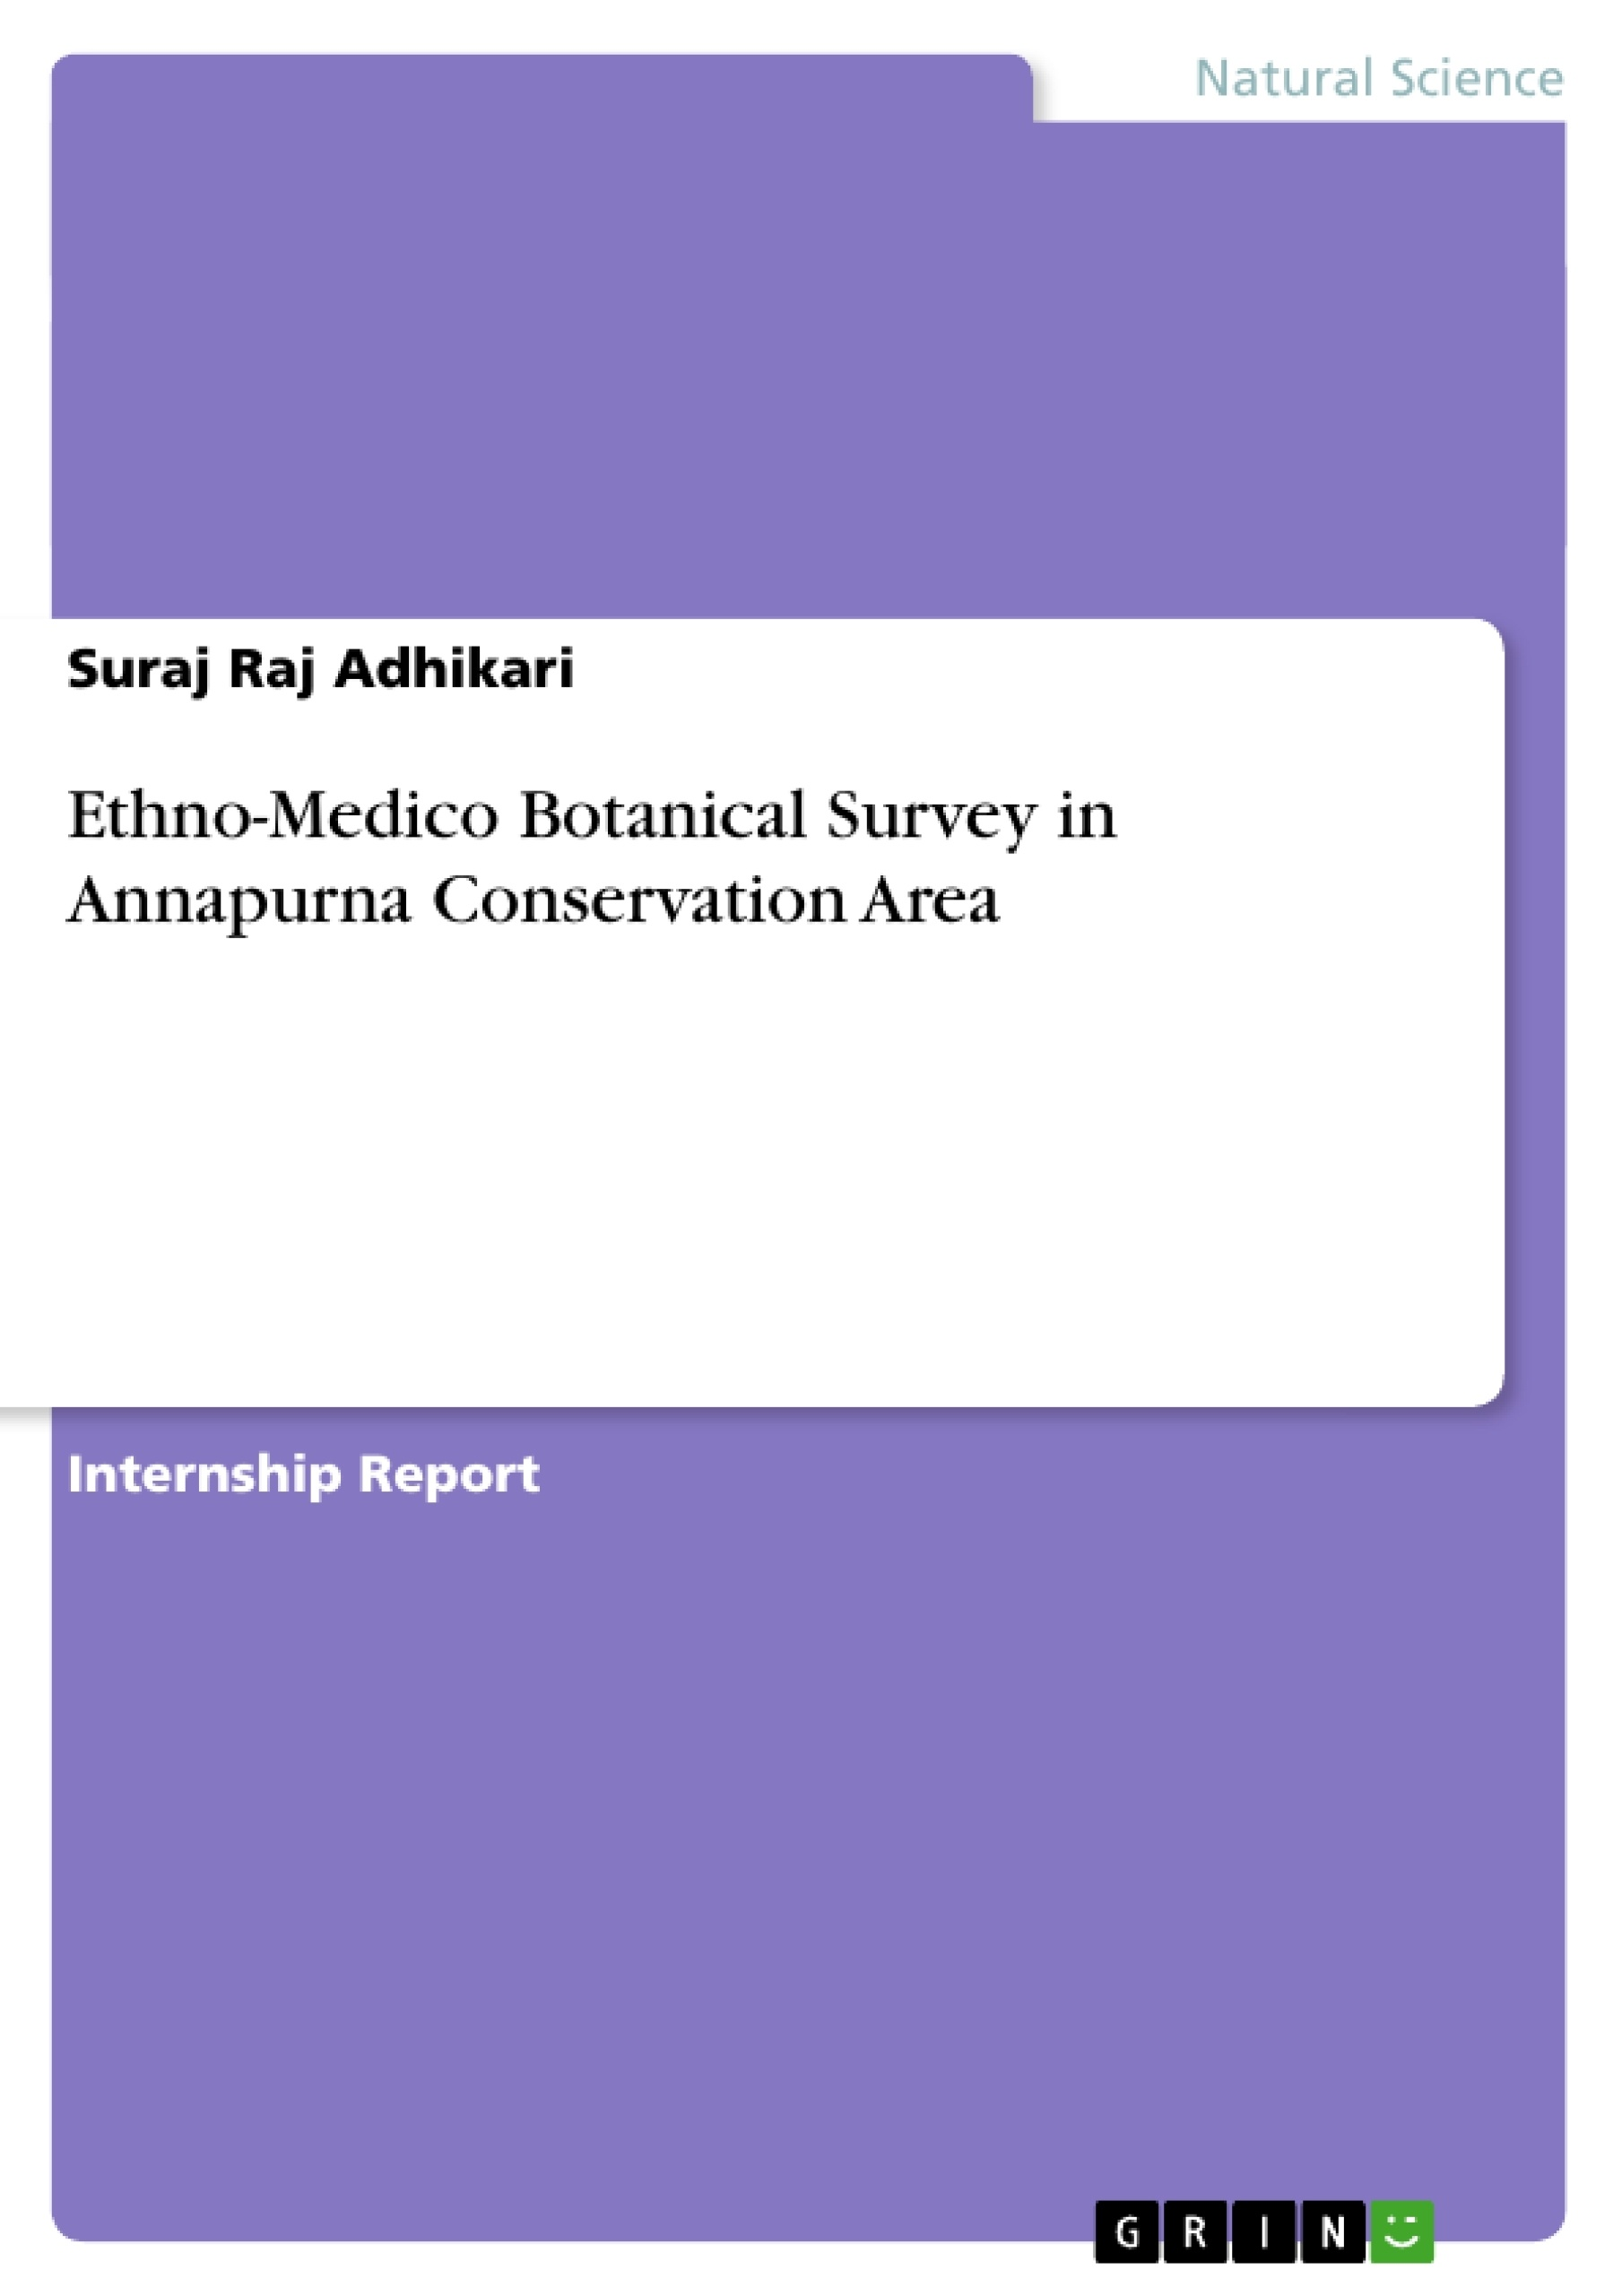 GRIN - Ethno-Medico Botanical Survey in Annapurna Conservation Area